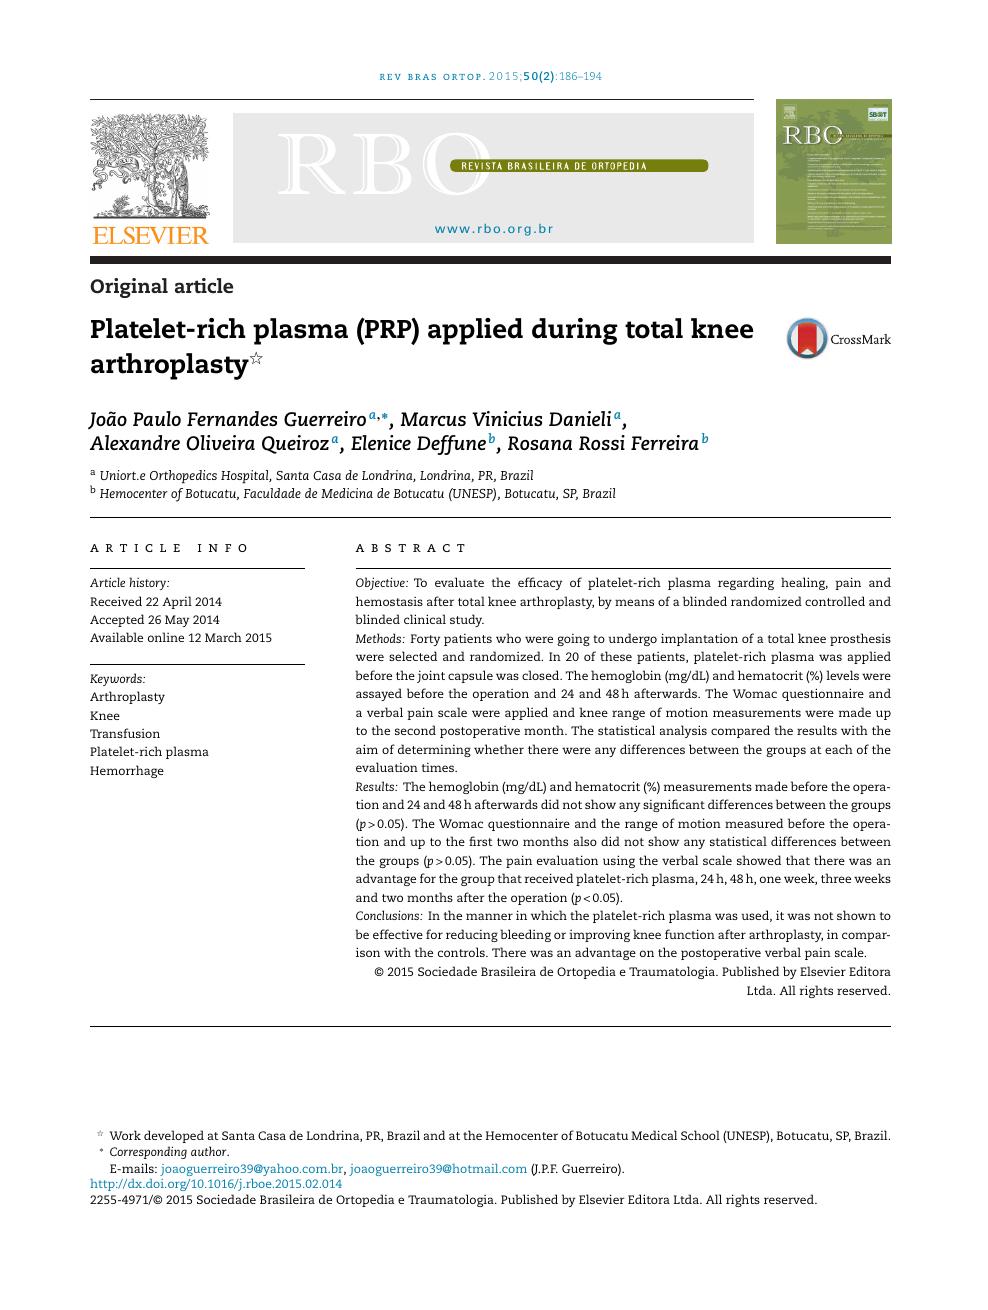 Platelet-rich plasma (PRP) applied during total knee